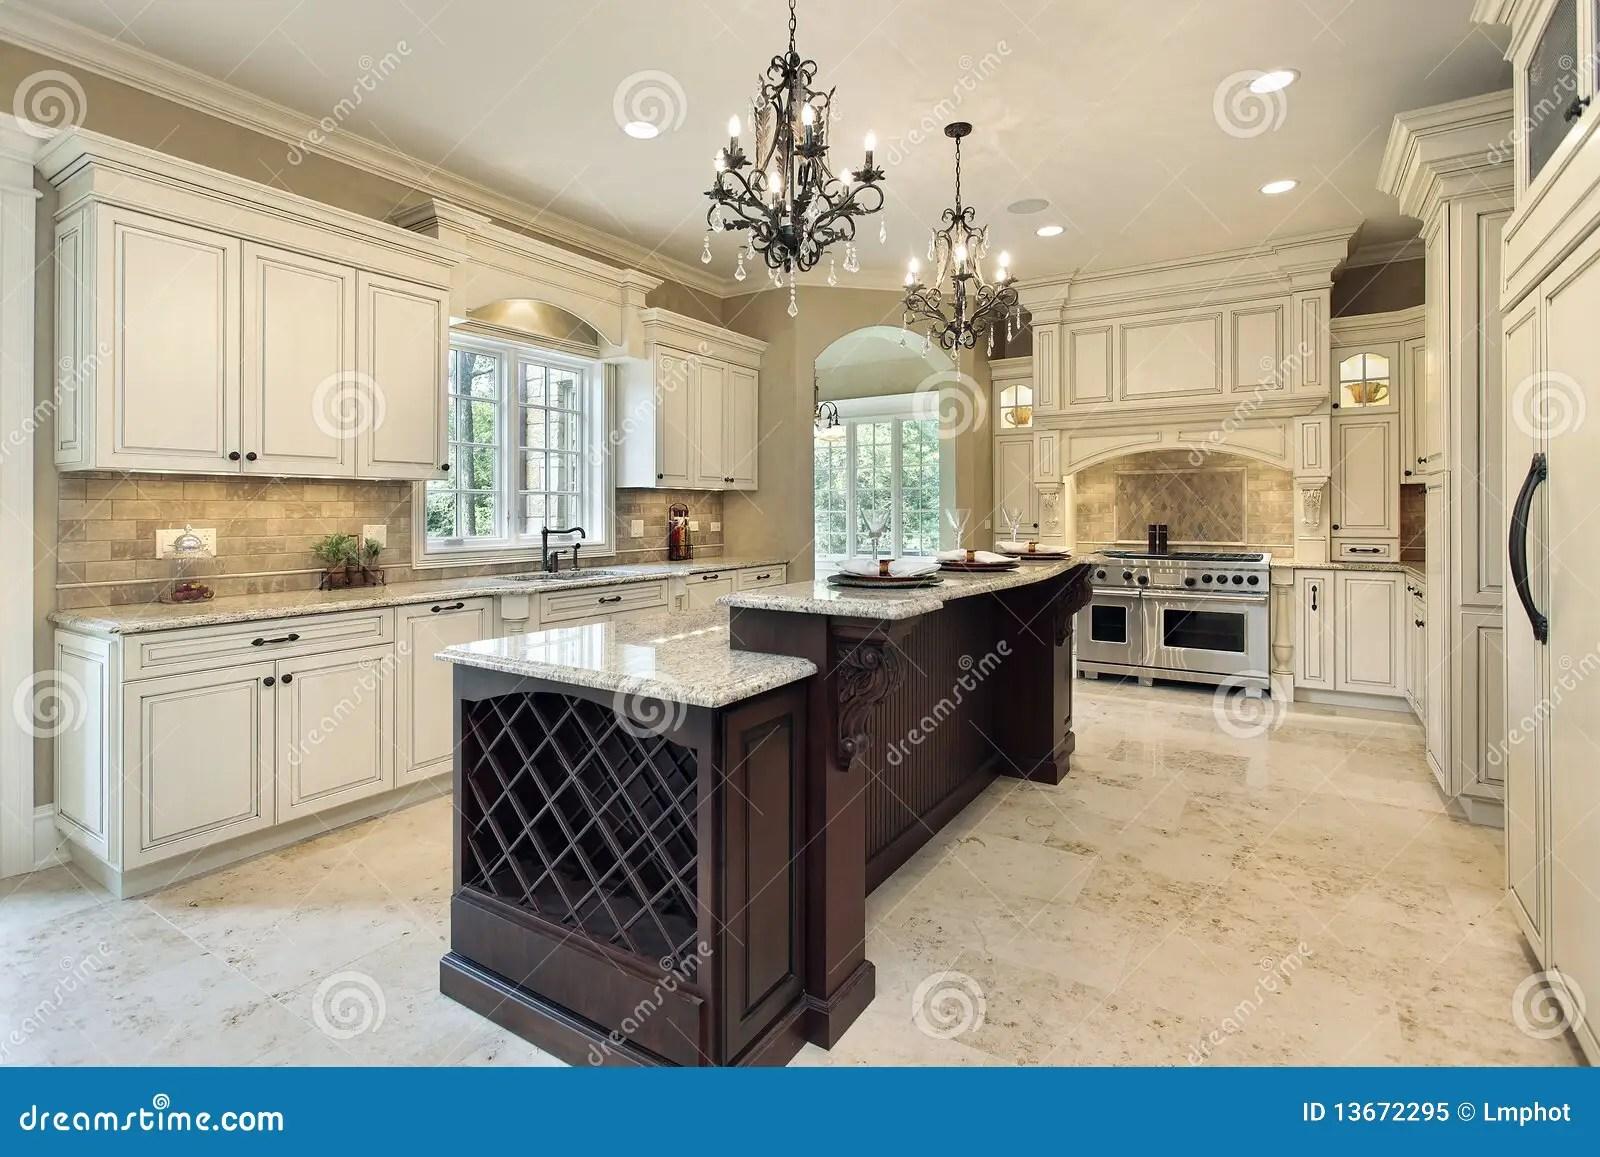 kitchen inventory settee 甲板双海岛厨房库存图片 图片包括有厨房 设计 家具 现代 空间 装饰 建筑甲板双家新海岛的厨房